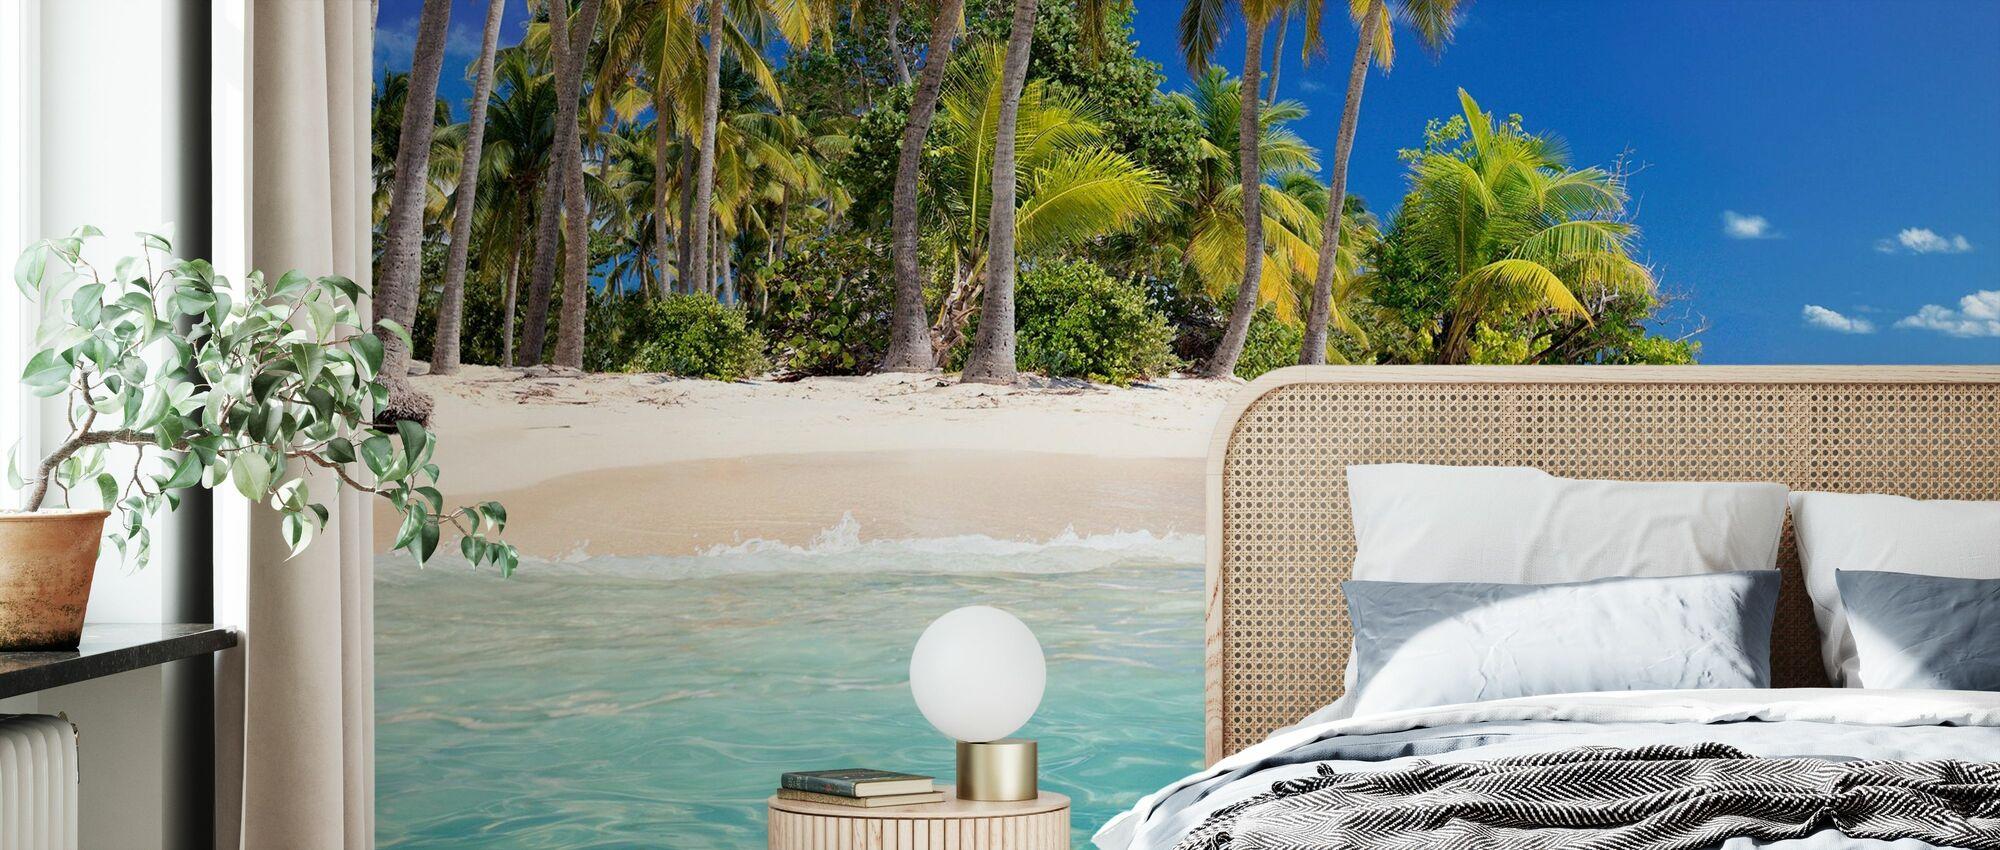 Tropical Beach Island - Wallpaper - Bedroom